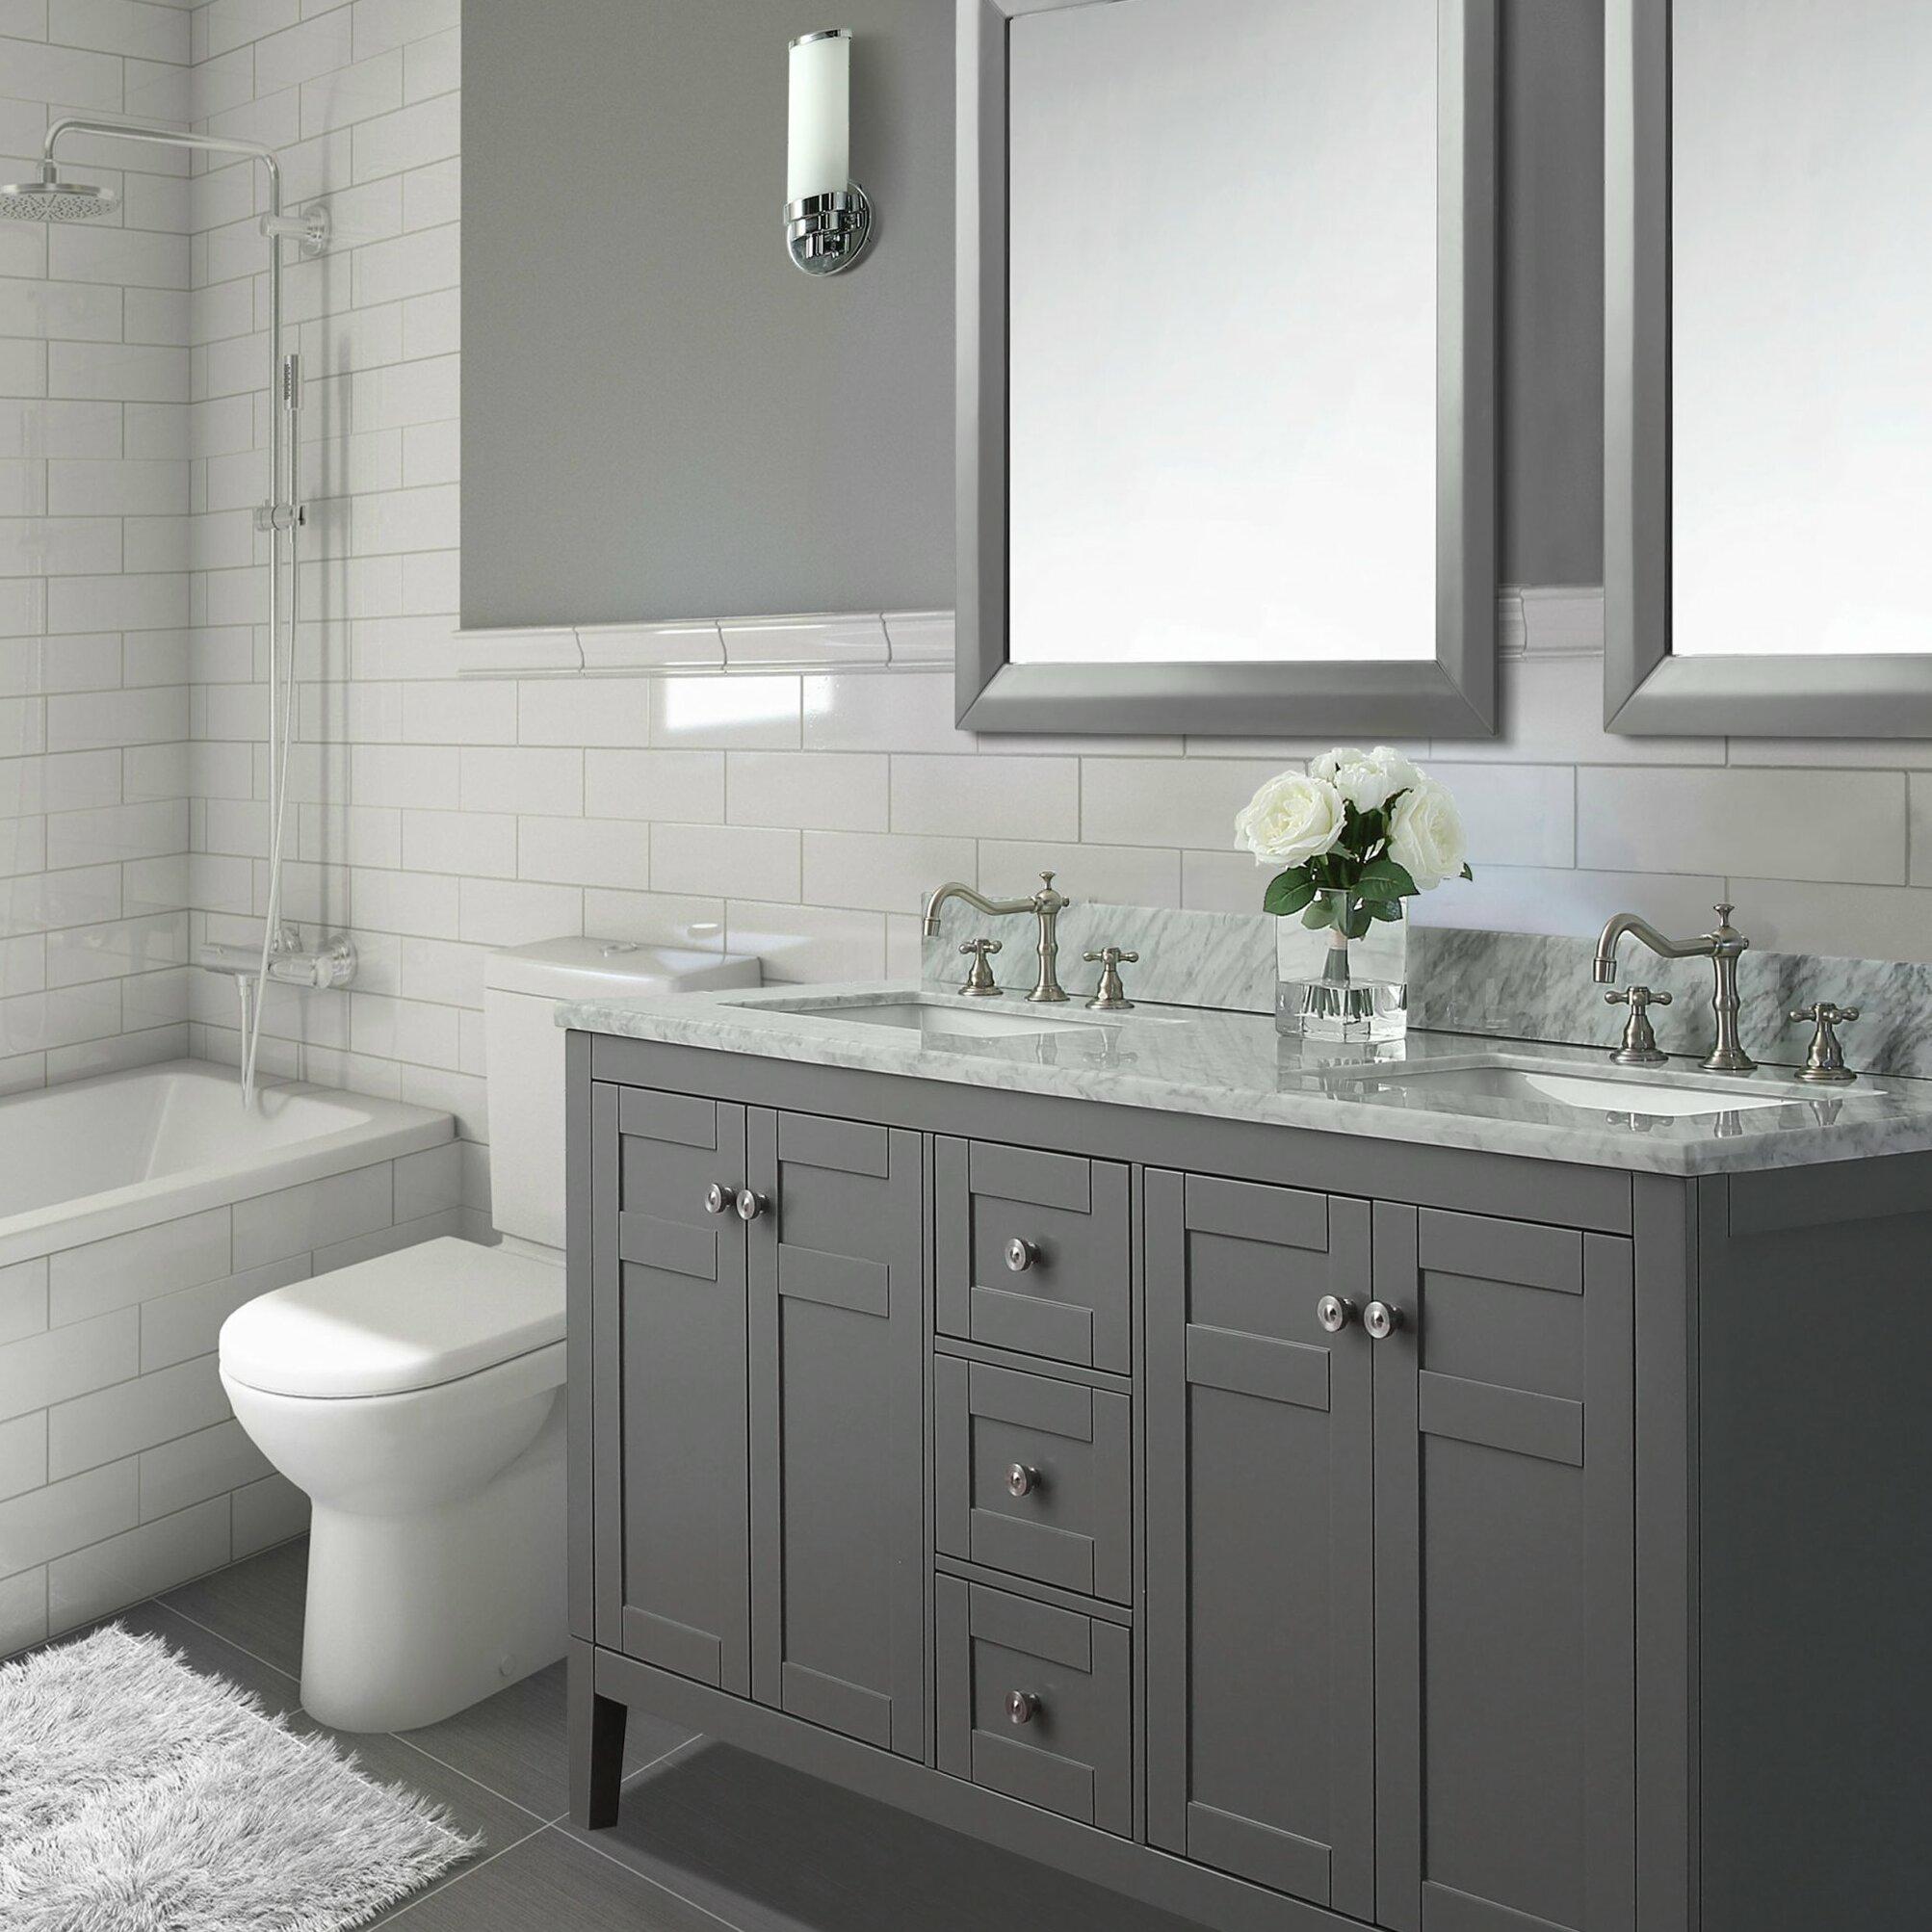 Ancerre Designs Maili 60 quot  Double Bath Vanity Set. Ancerre Designs Maili 60  Double Bath Vanity Set   Reviews   Wayfair